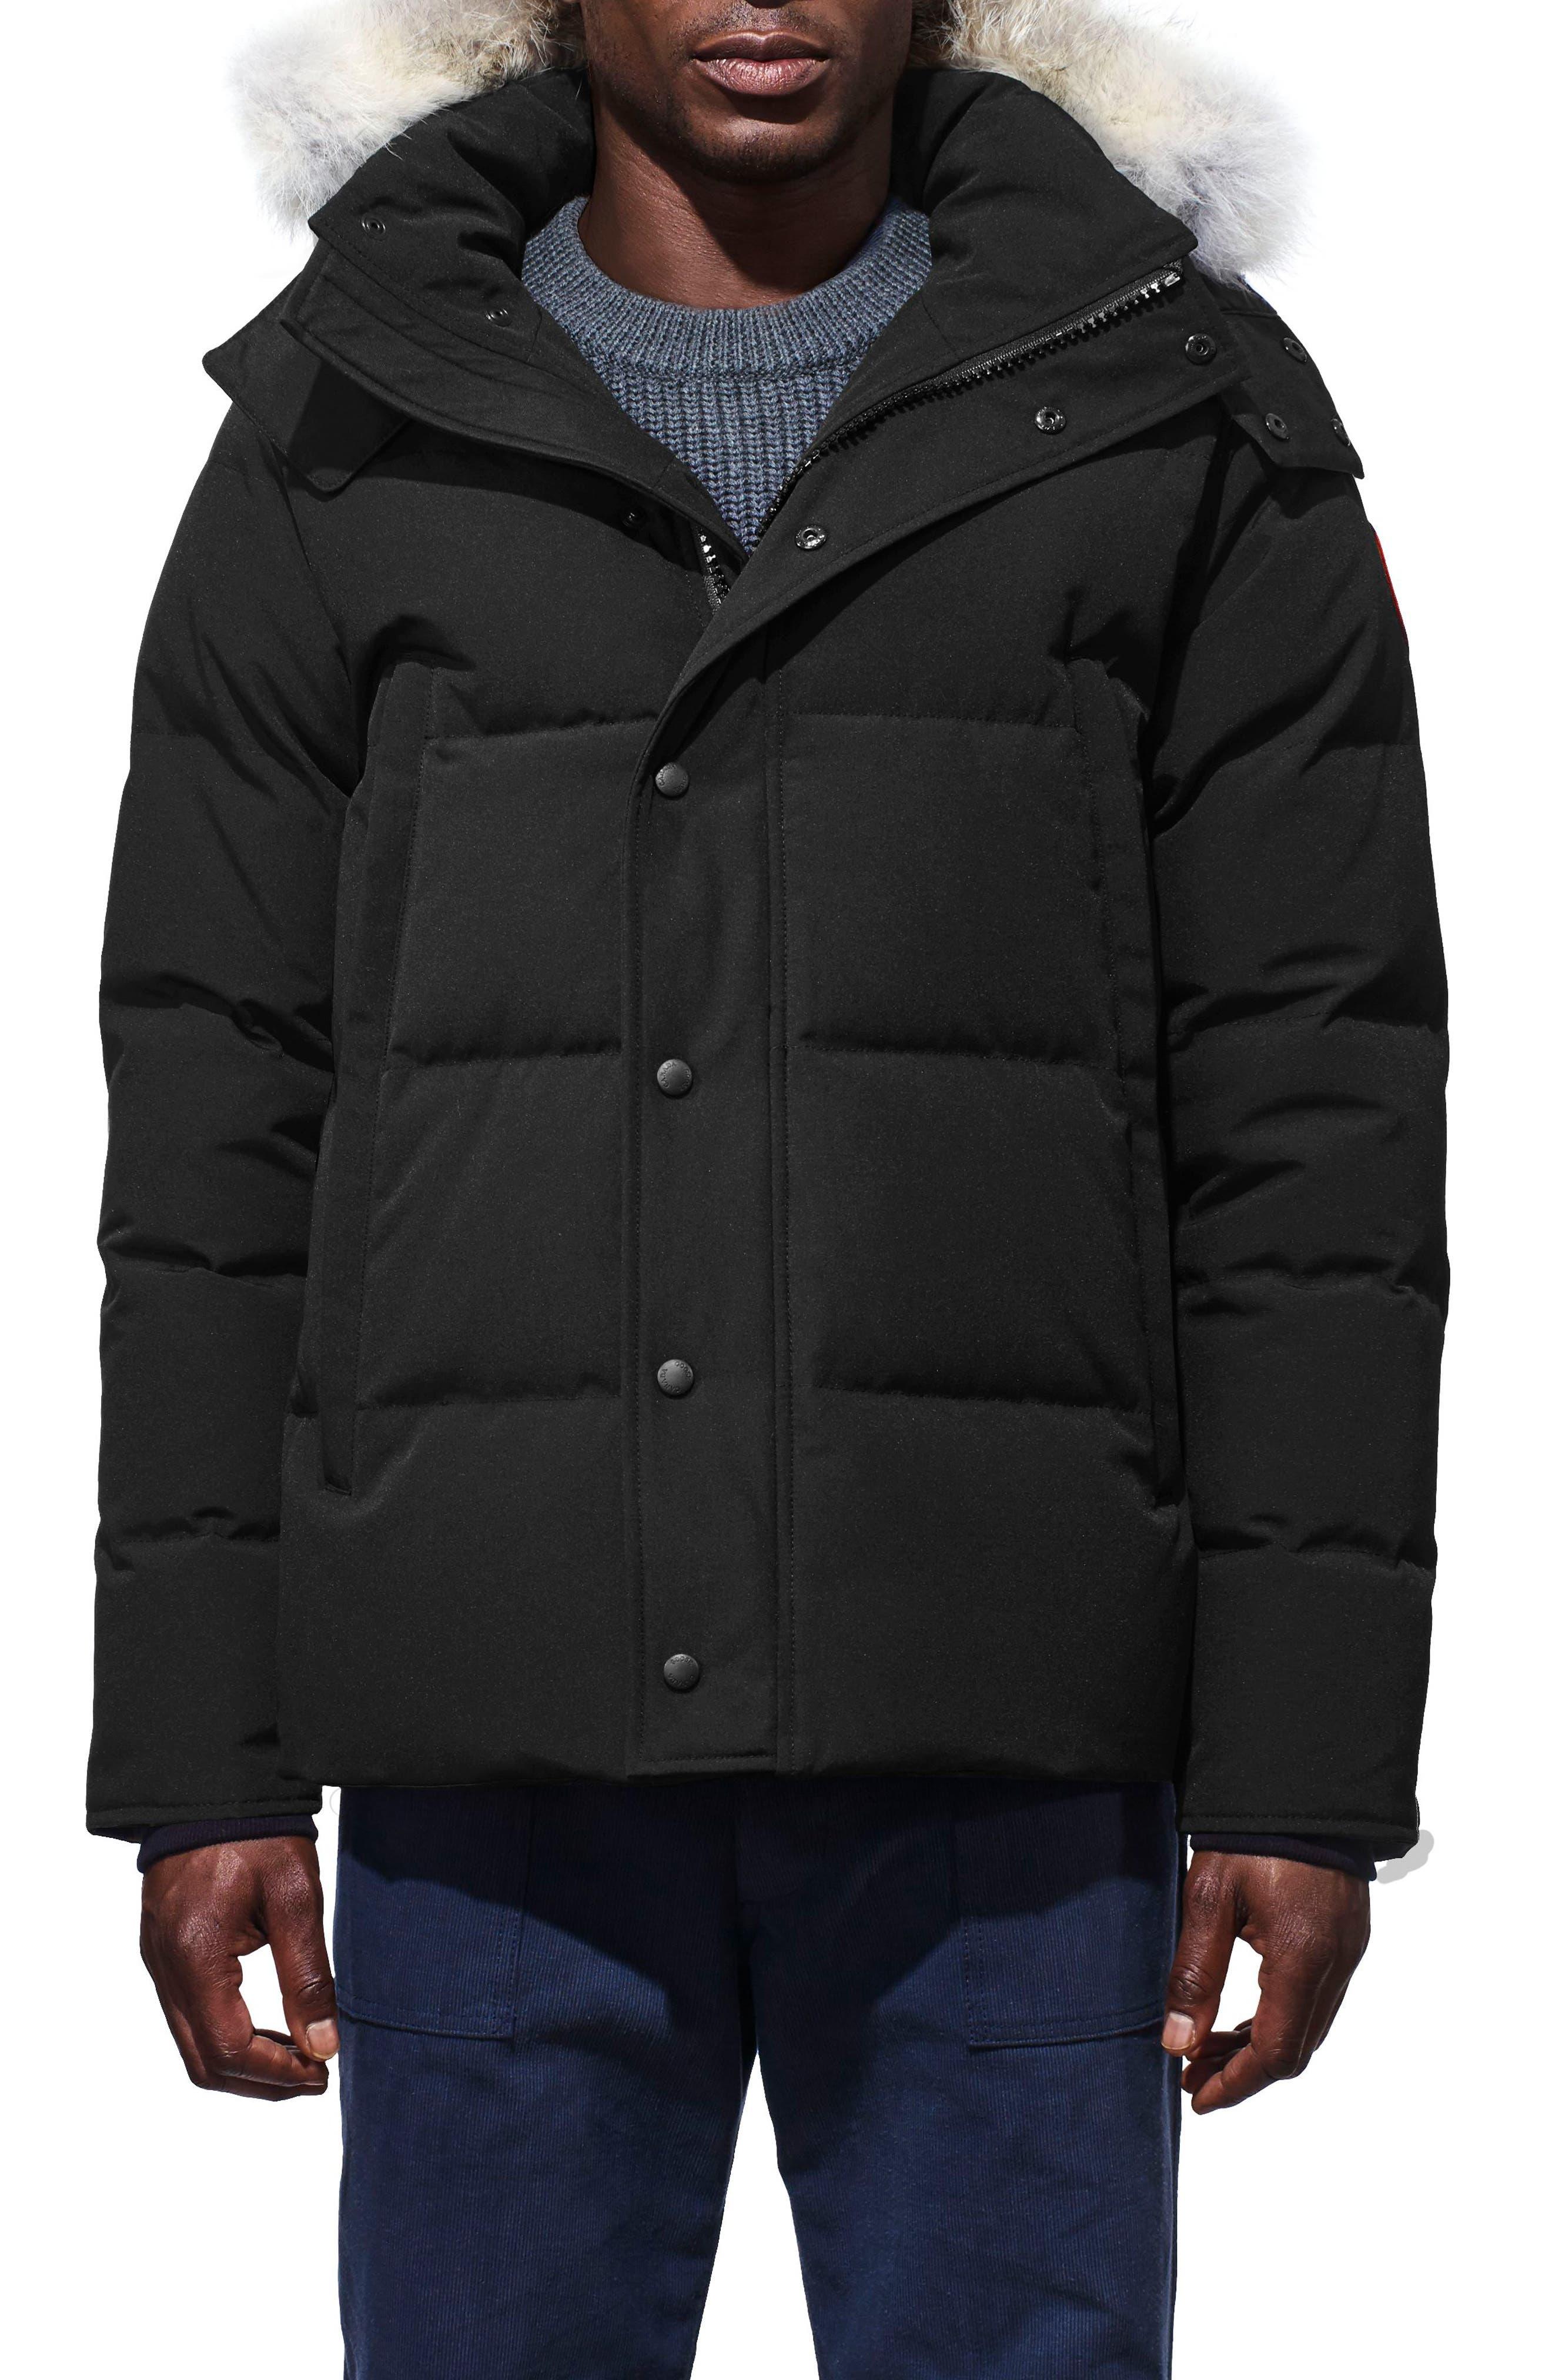 Canada Goose Wyndham Slim Fit Genuine Coyote Fur Trim Down Jacket, Black